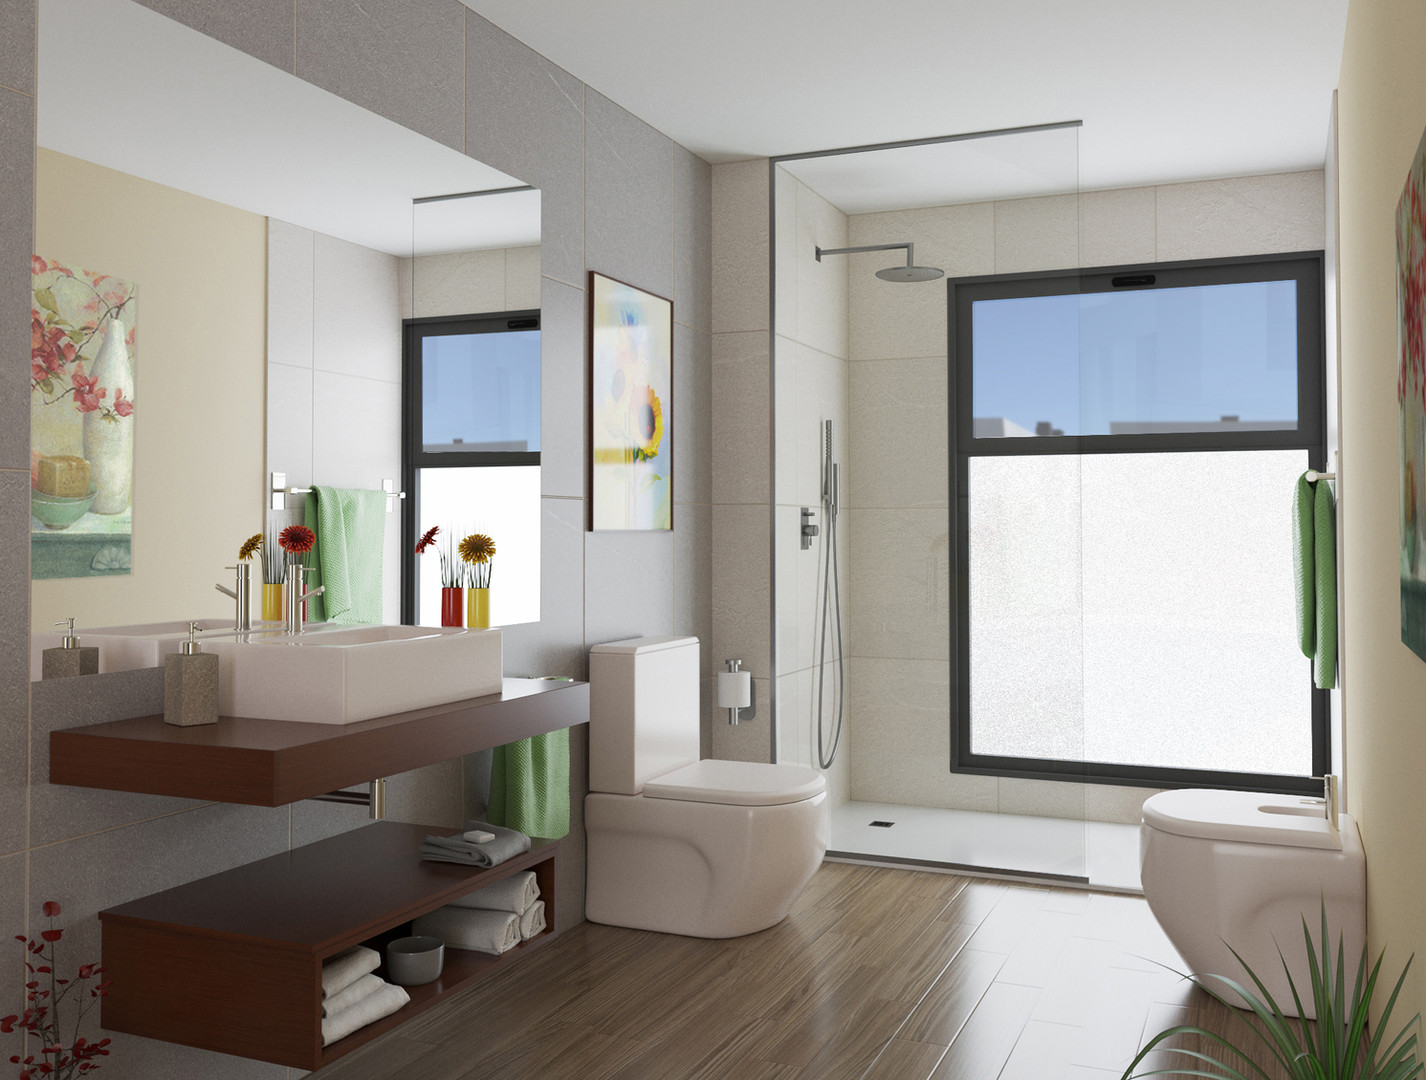 baño_alta_modificado_cielo_espejo.jpg